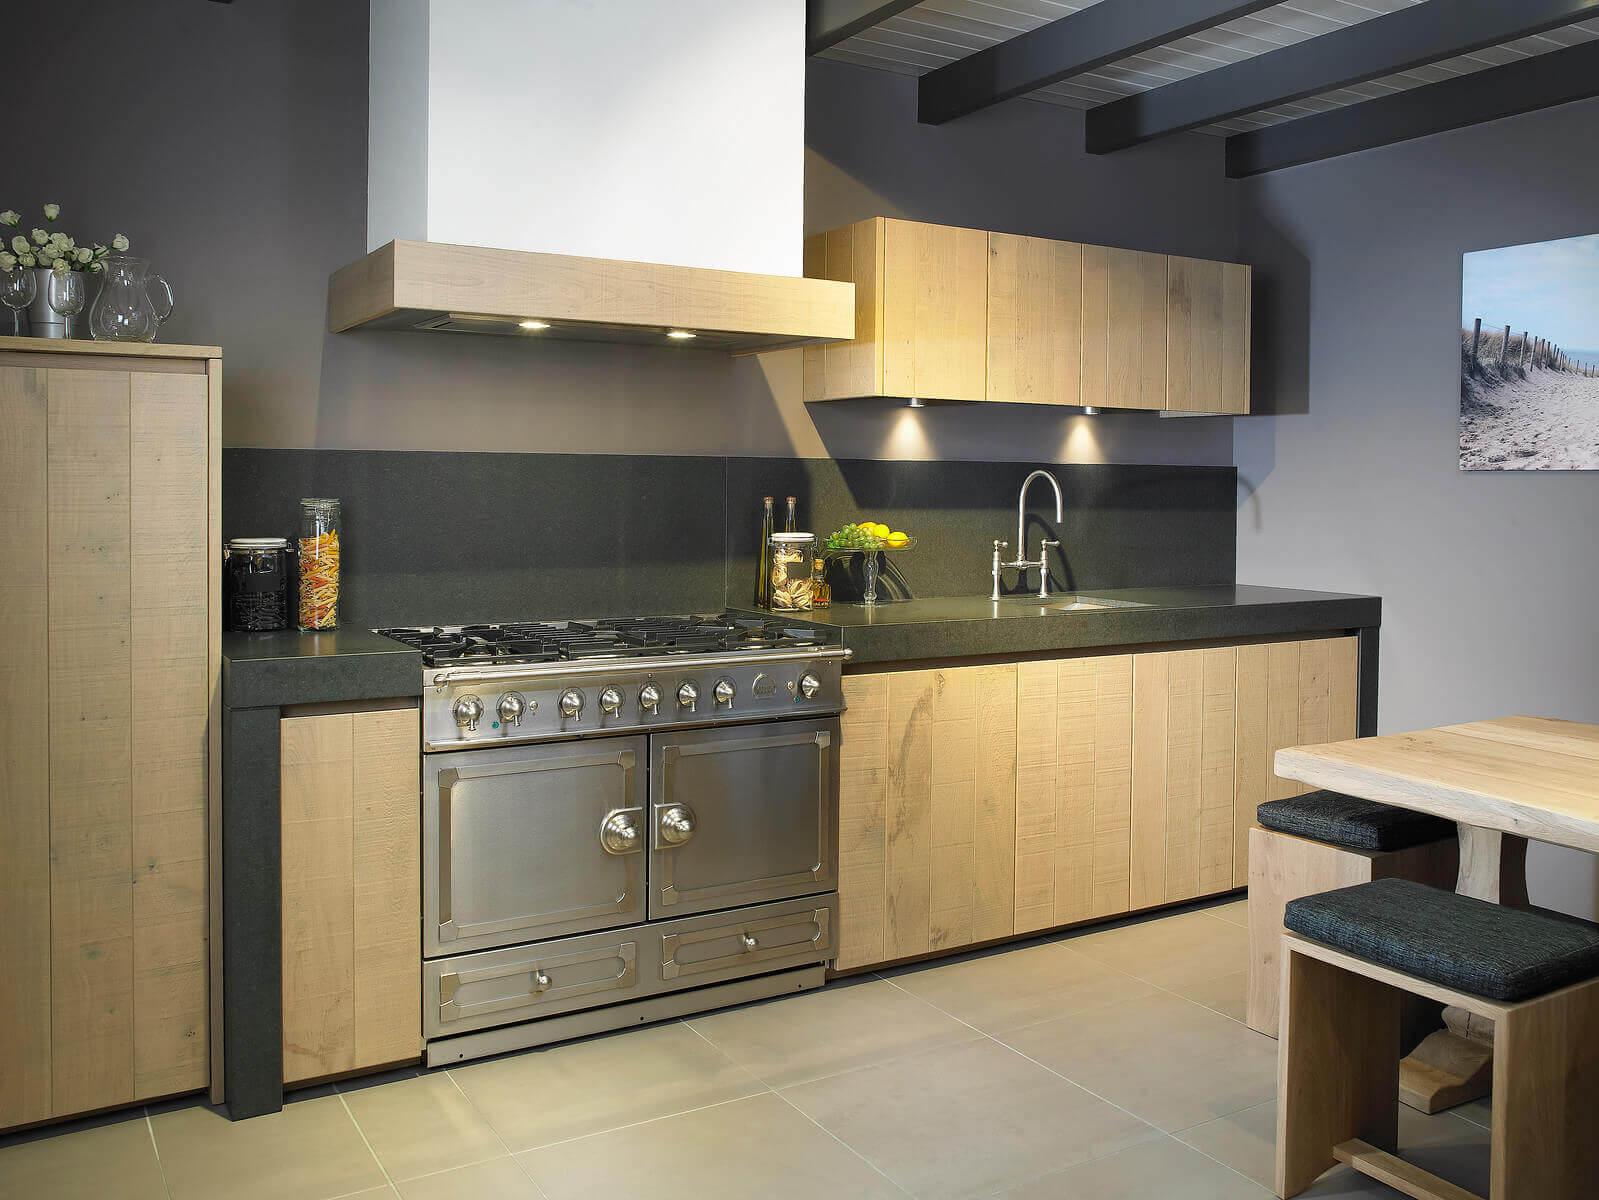 Eiken keukens van Tieleman Keukens